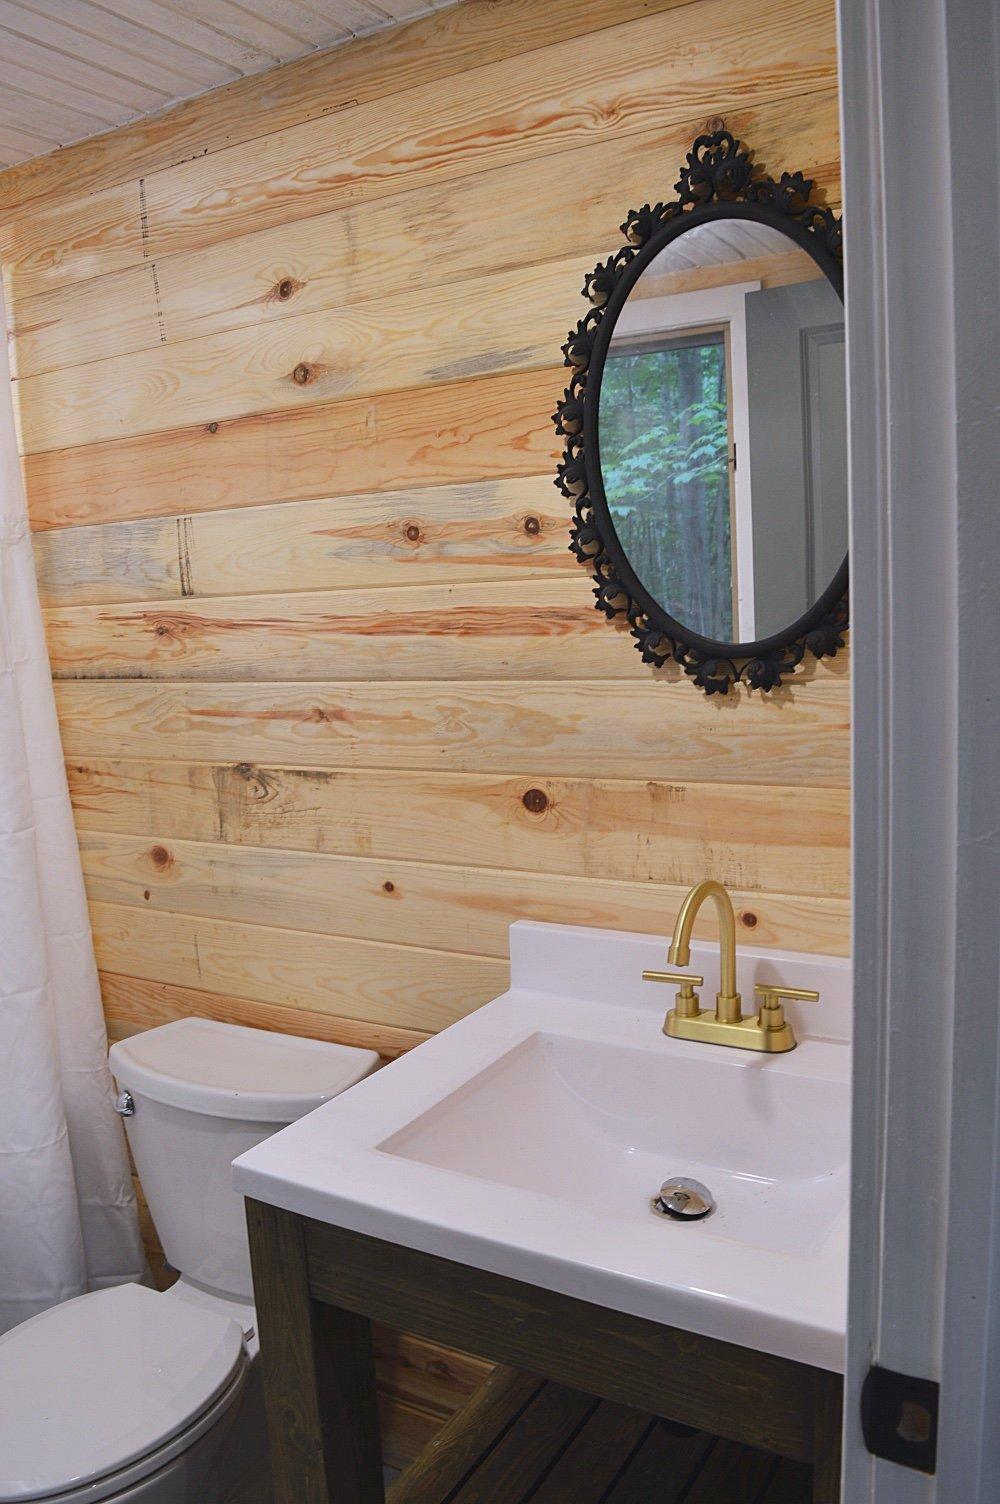 cabin bathroom in the woods